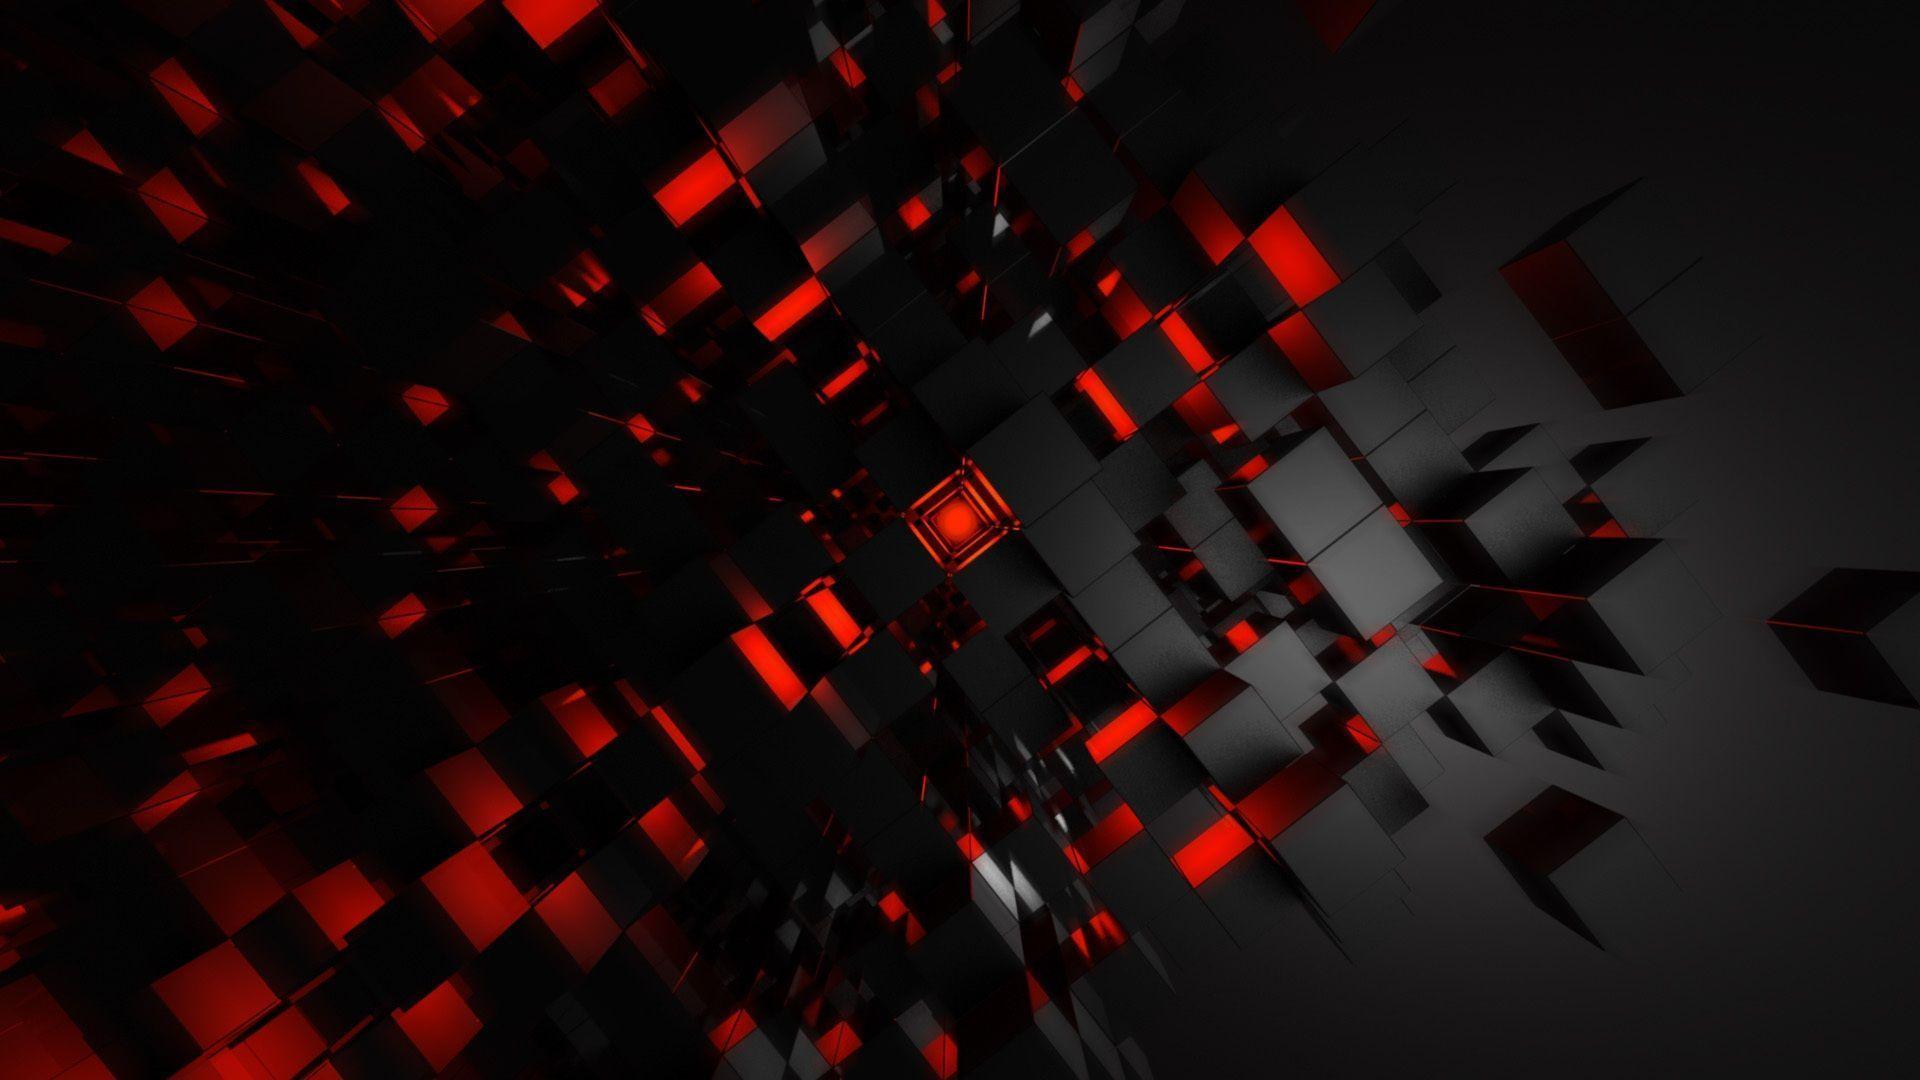 Wallpaper Hd Black Red